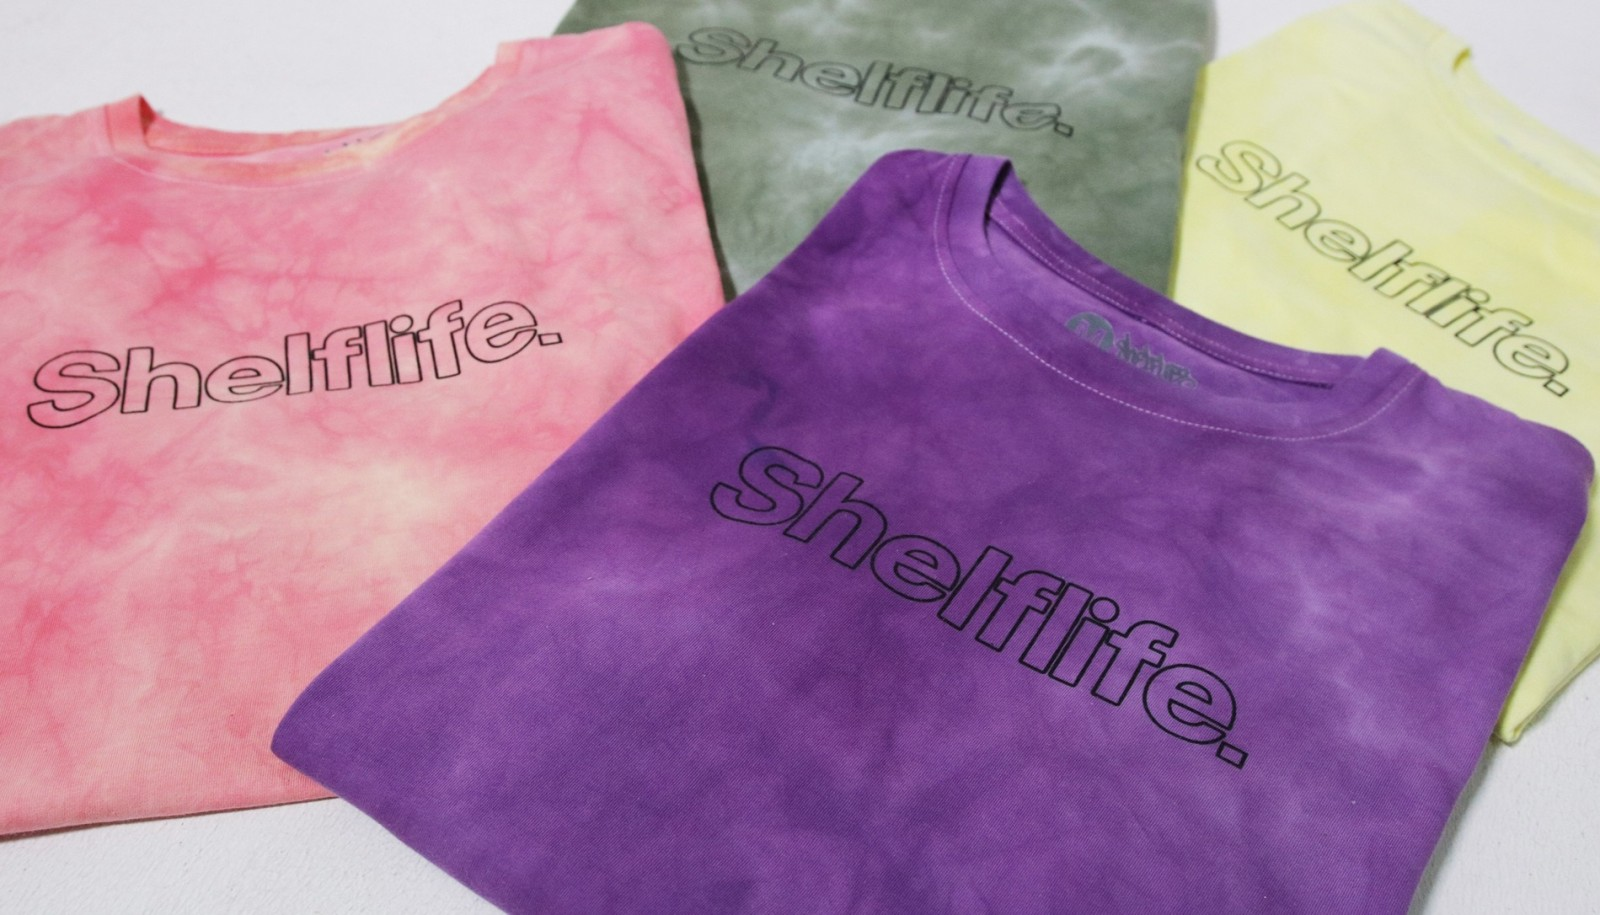 Shelflife Garment Dyed Pack